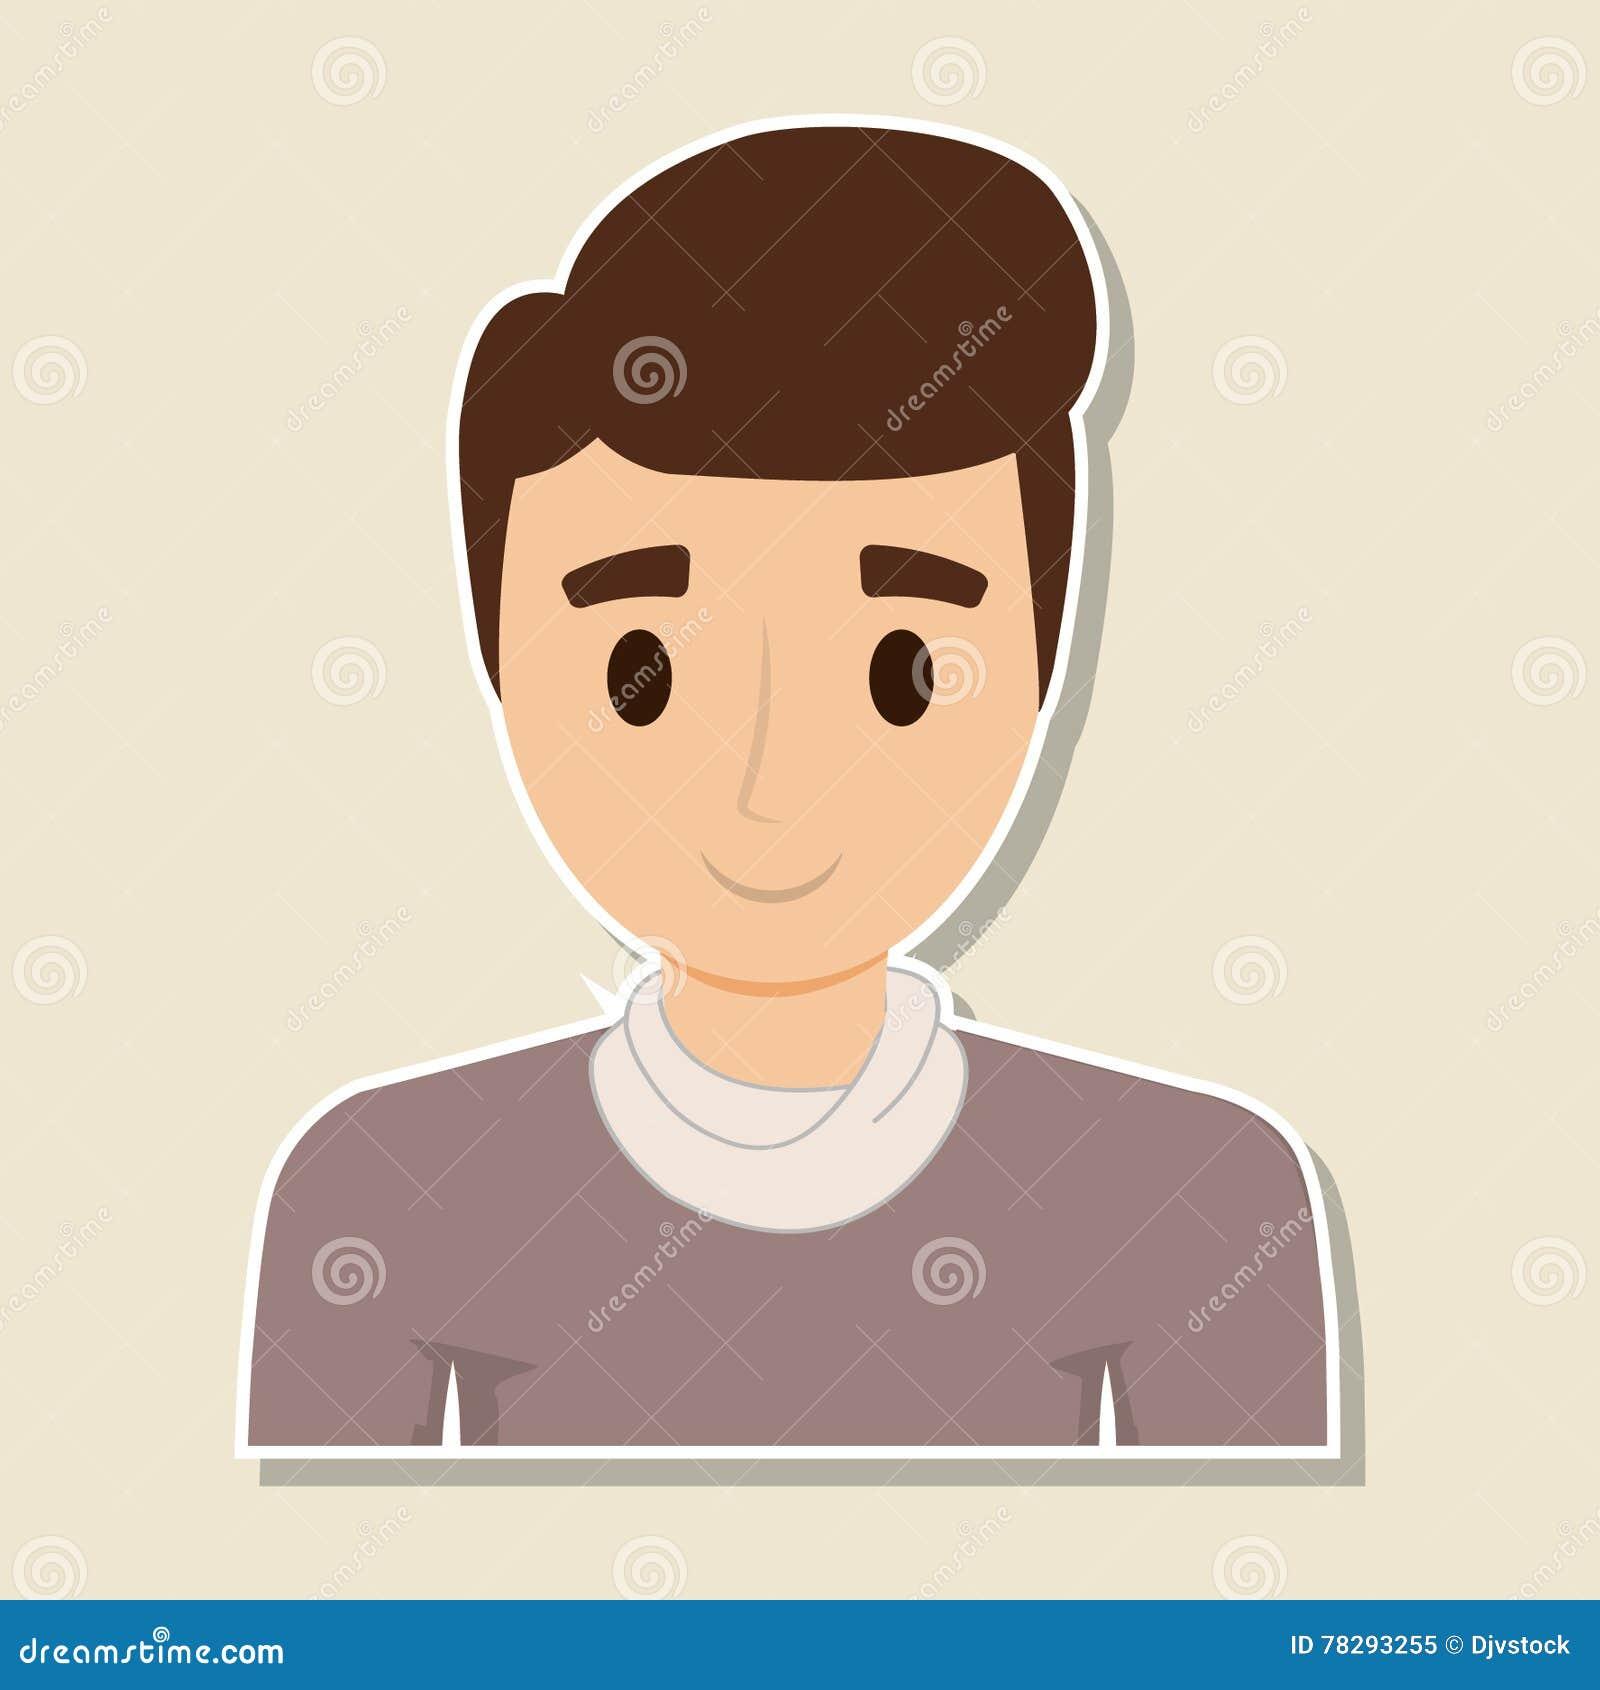 man cartoon person design stock vector illustration of success